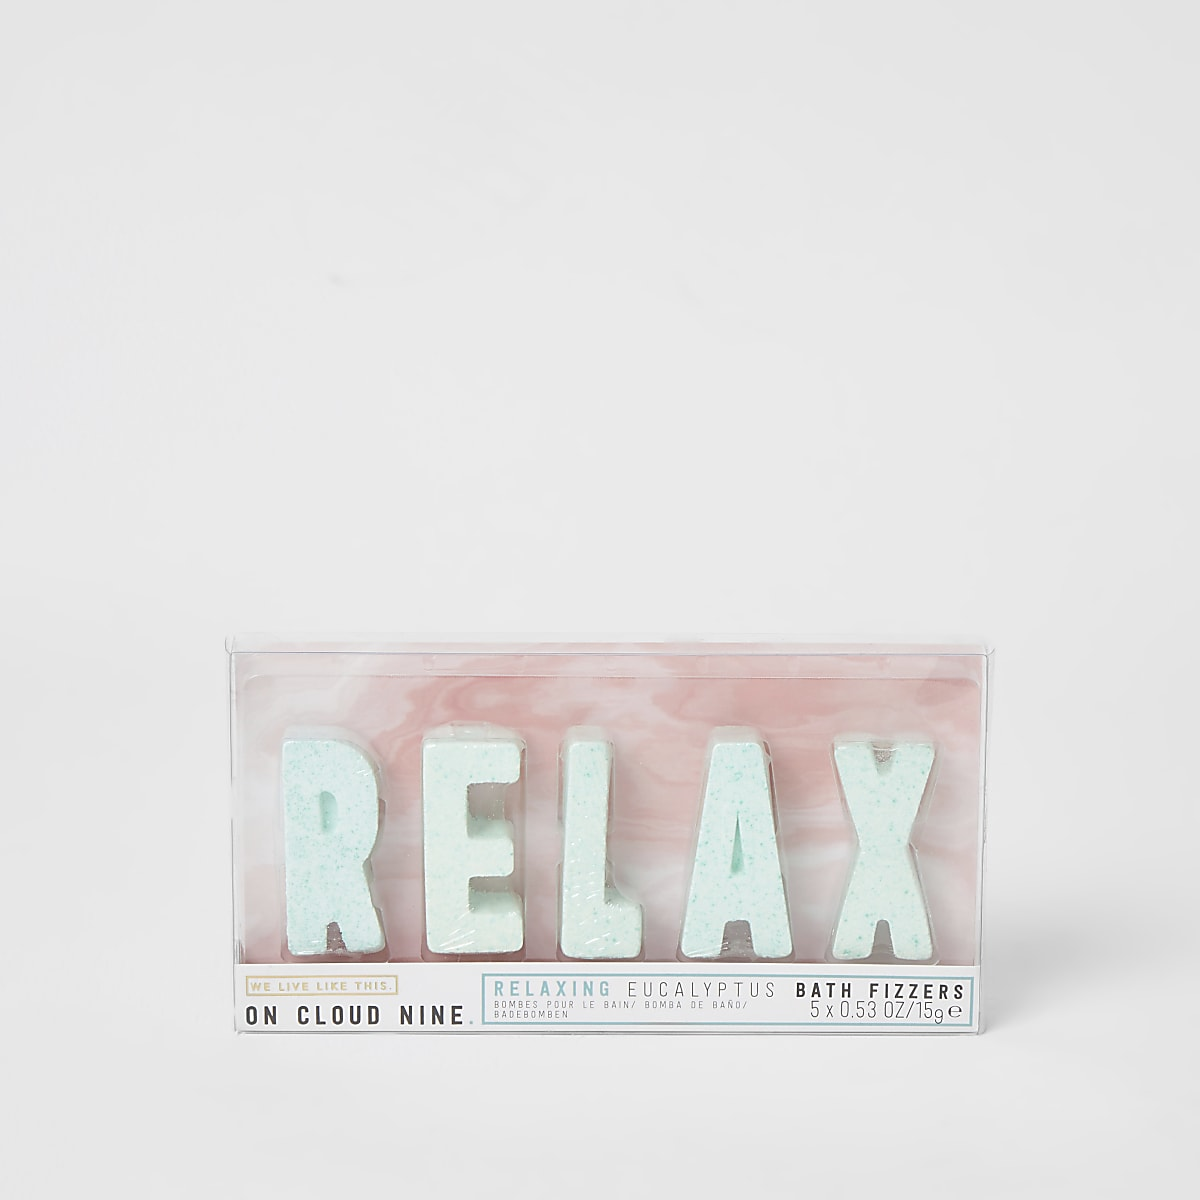 On cloud nine eucalyptus 'Relax'-bruisletters